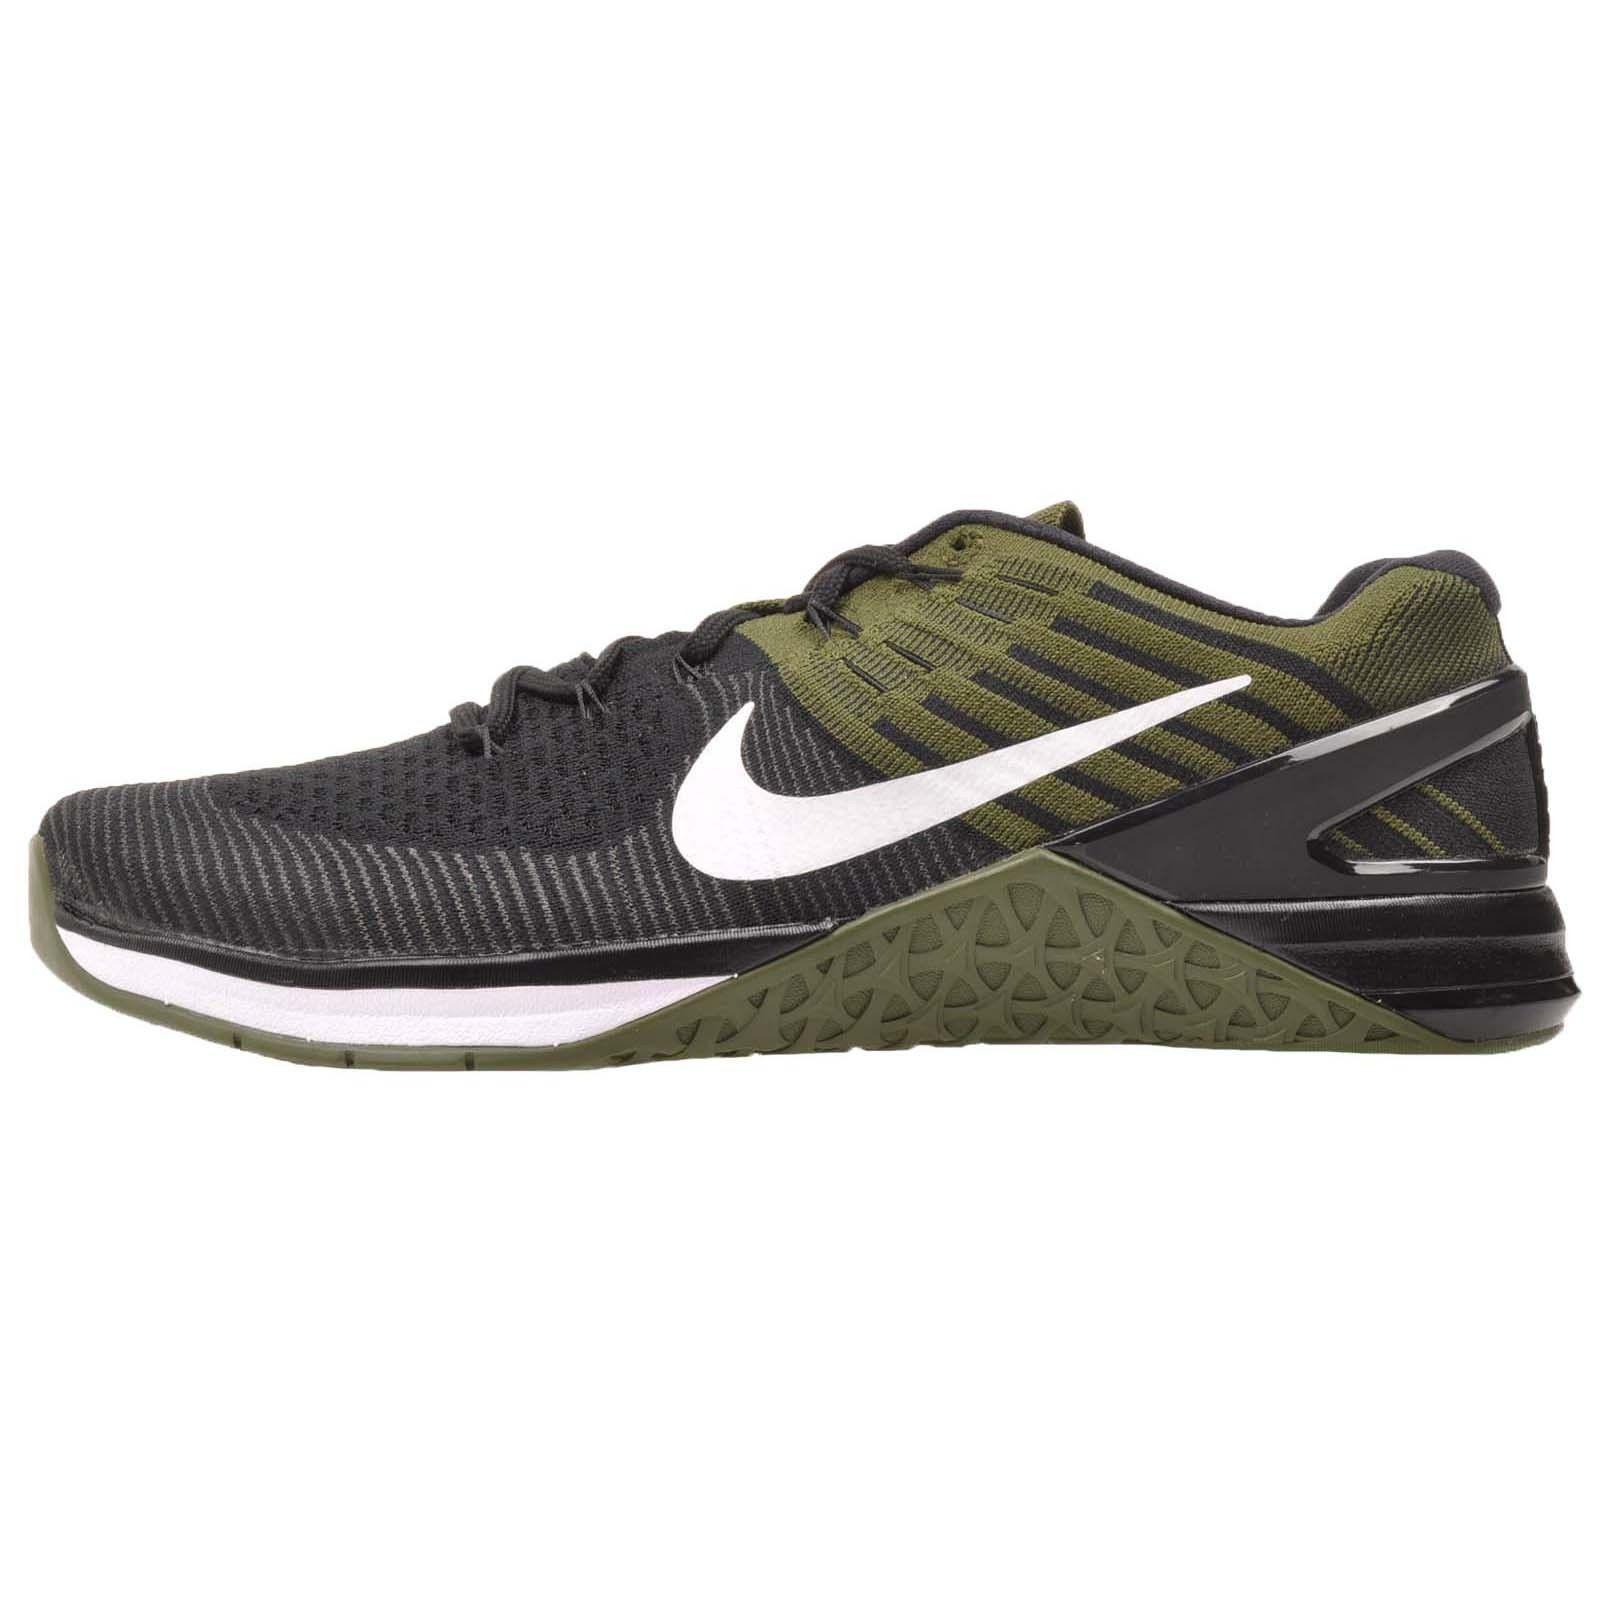 Nike Wmns Metcon DSX Flyknit Womens Cross Training Shoes Black 849809-003